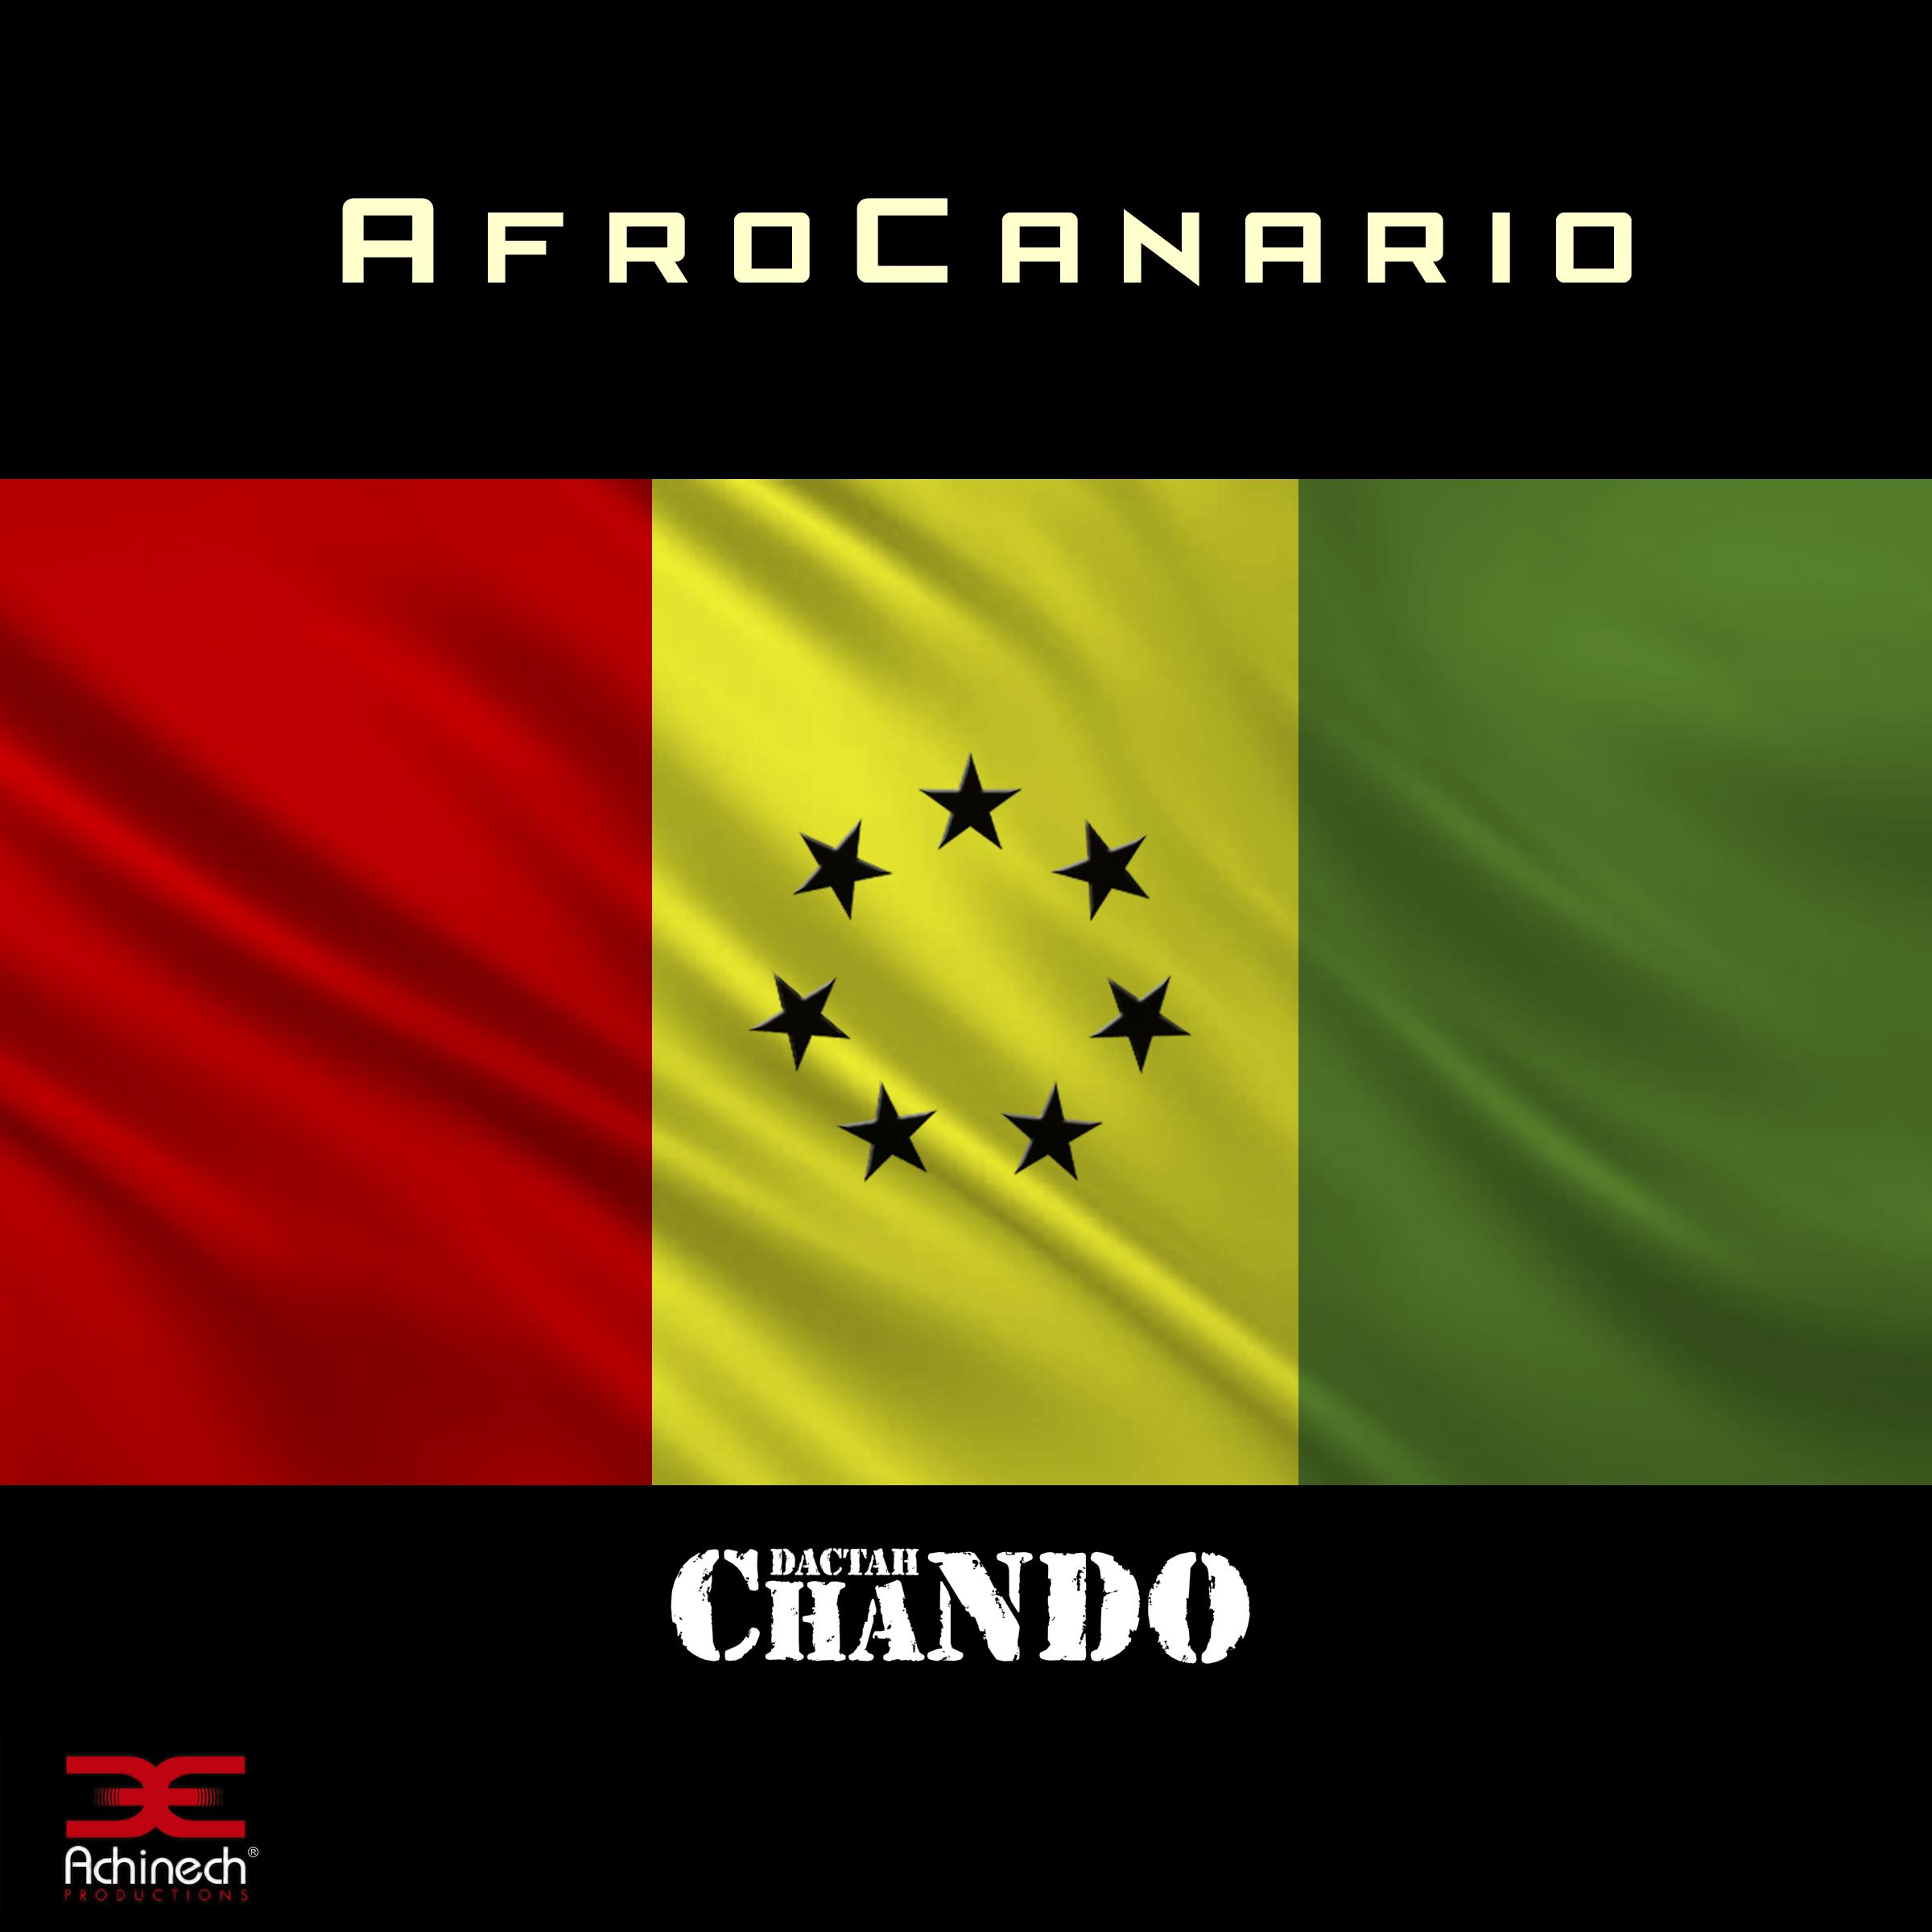 Artwork -  Dactah Chando - AfroCanario.jpg